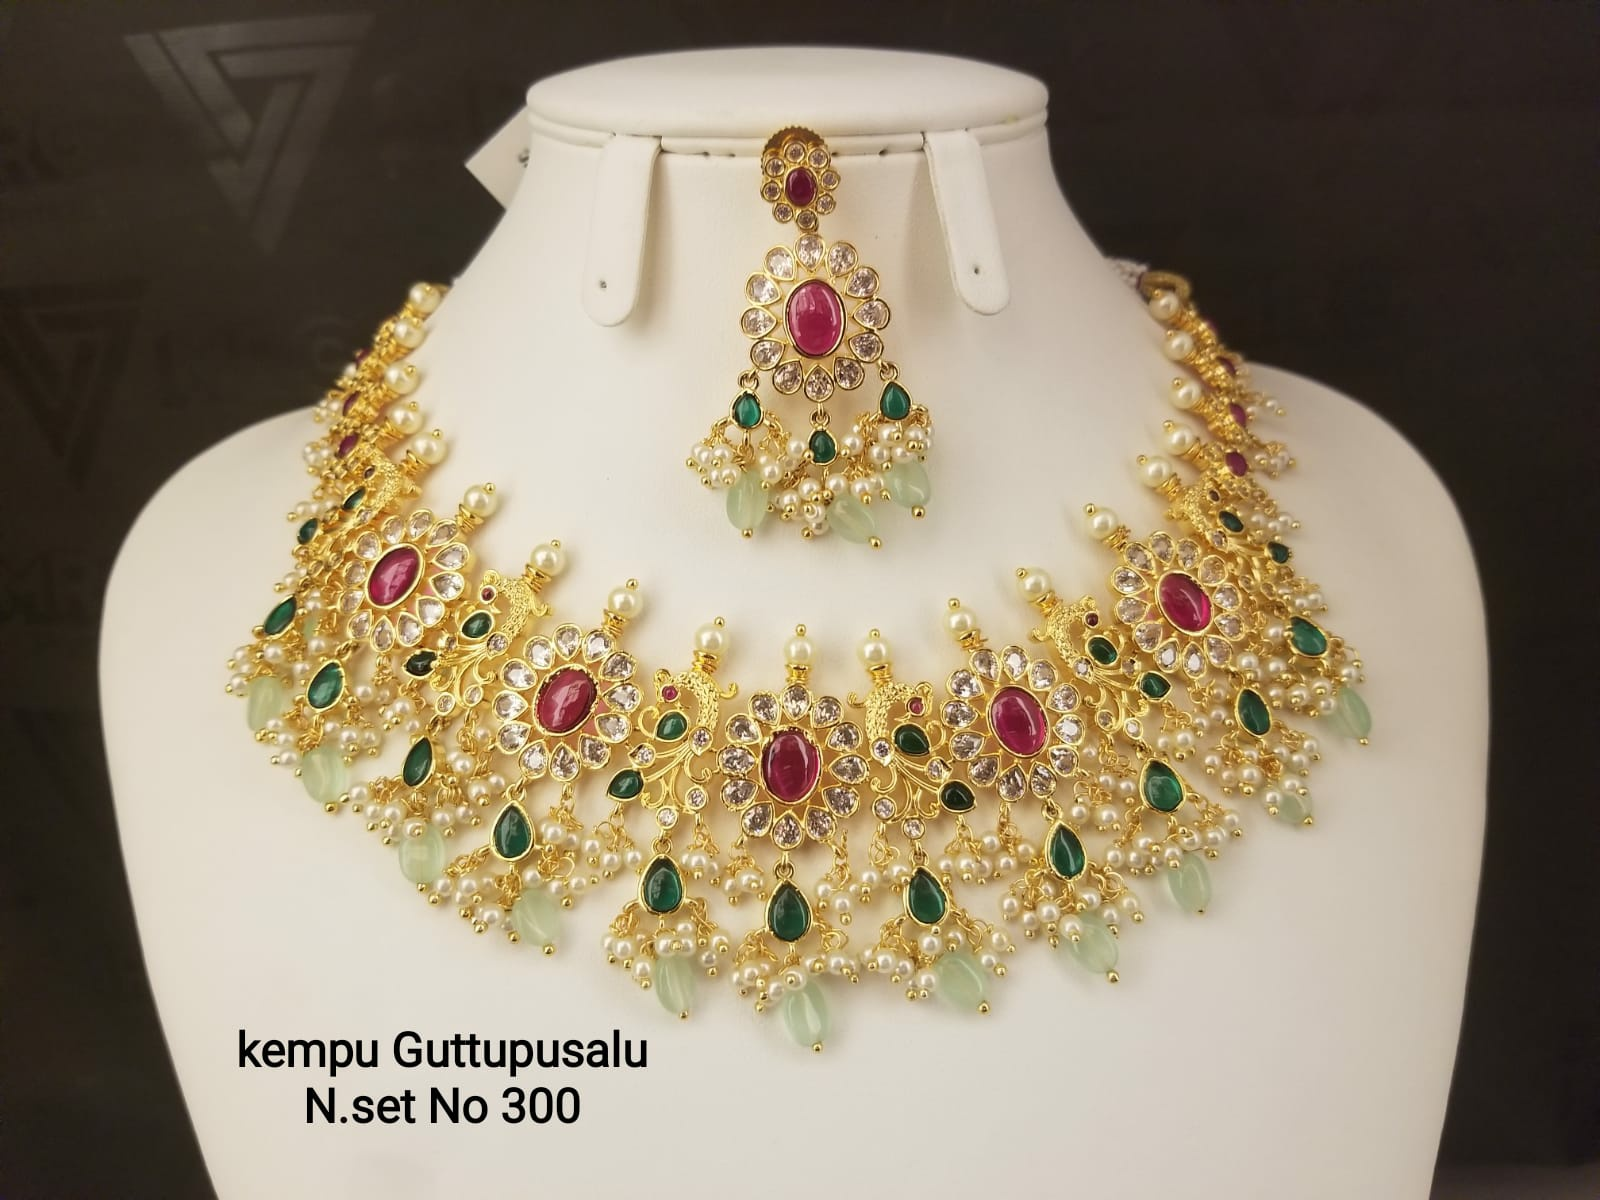 Beautiful one gram gold kempu Guttapusalu necklace. matte finish 1 gram gold jewellery one gram gold antique jewellery 1 gm gold ornaments